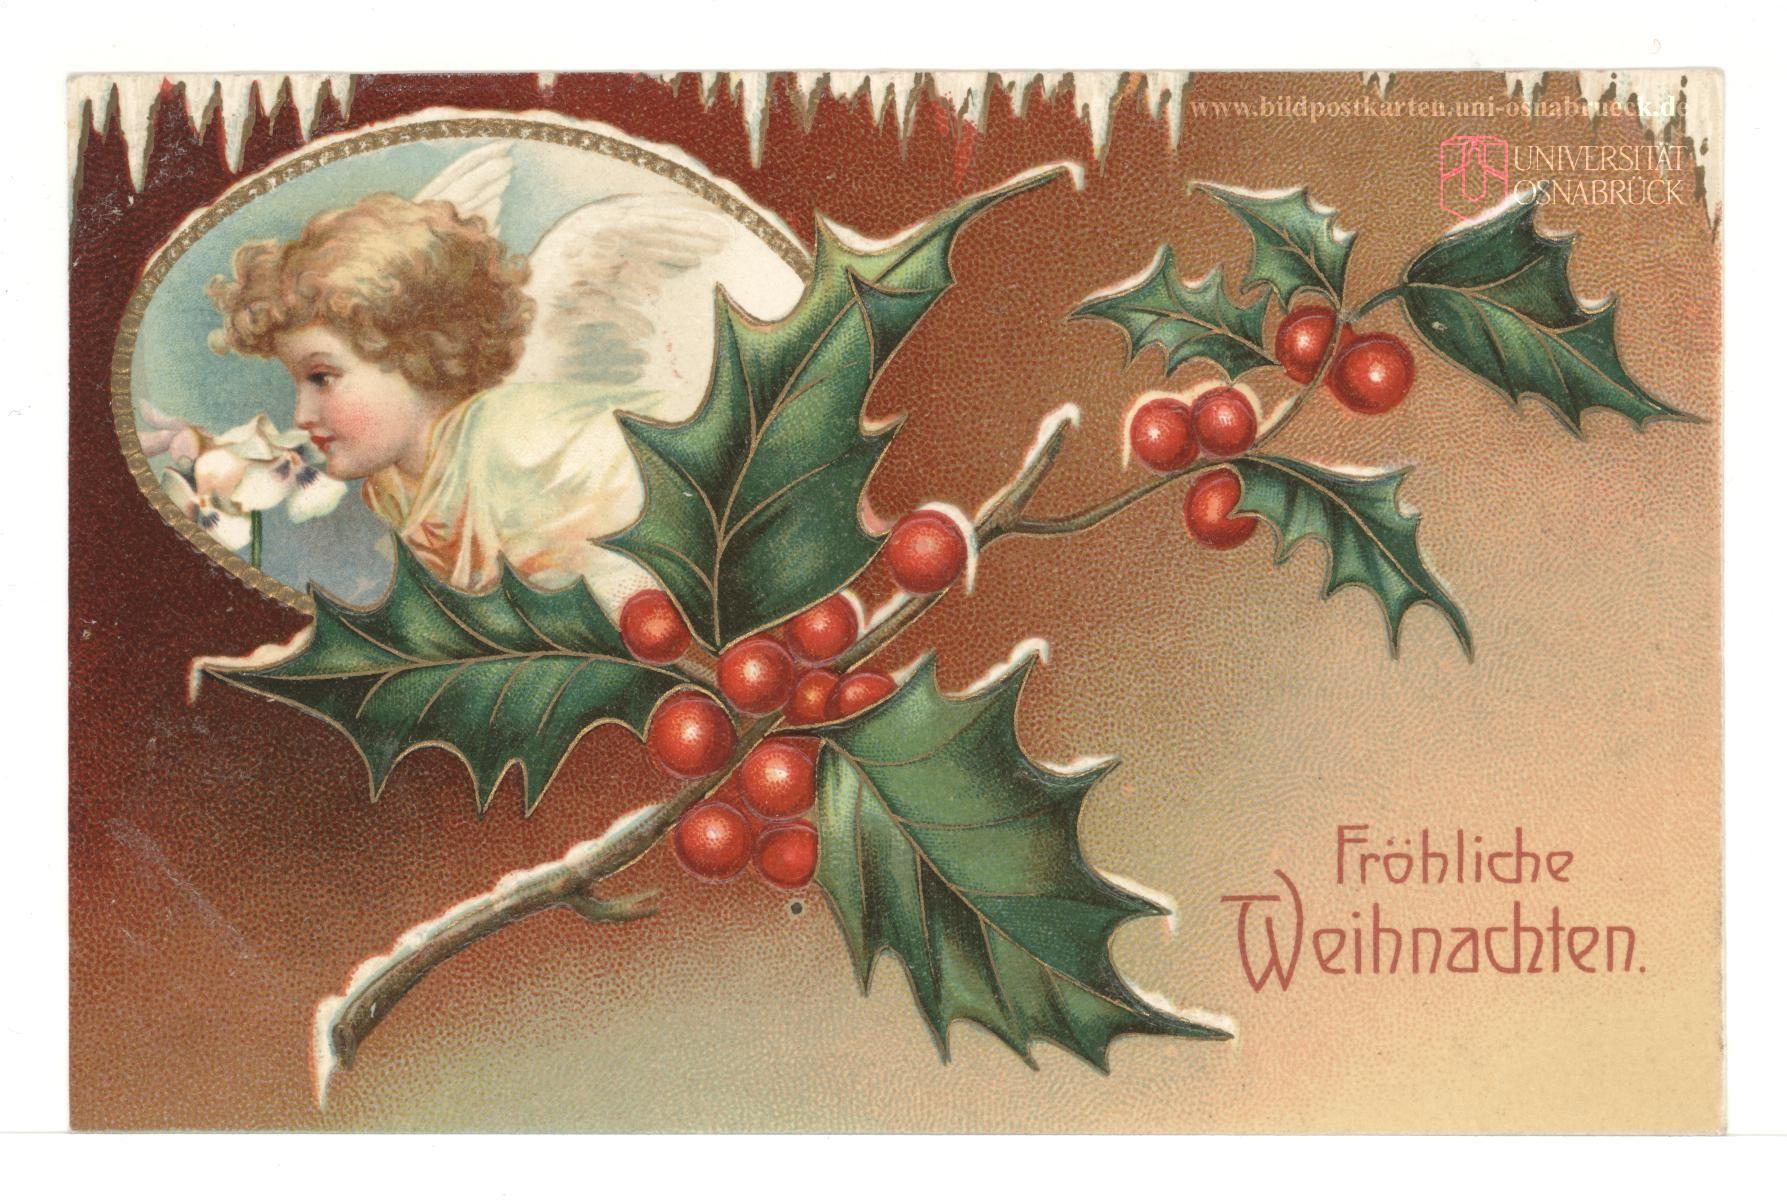 Fröhliche Weihnachten http://www.podcast-university.com/displayimage.php?pid=10693